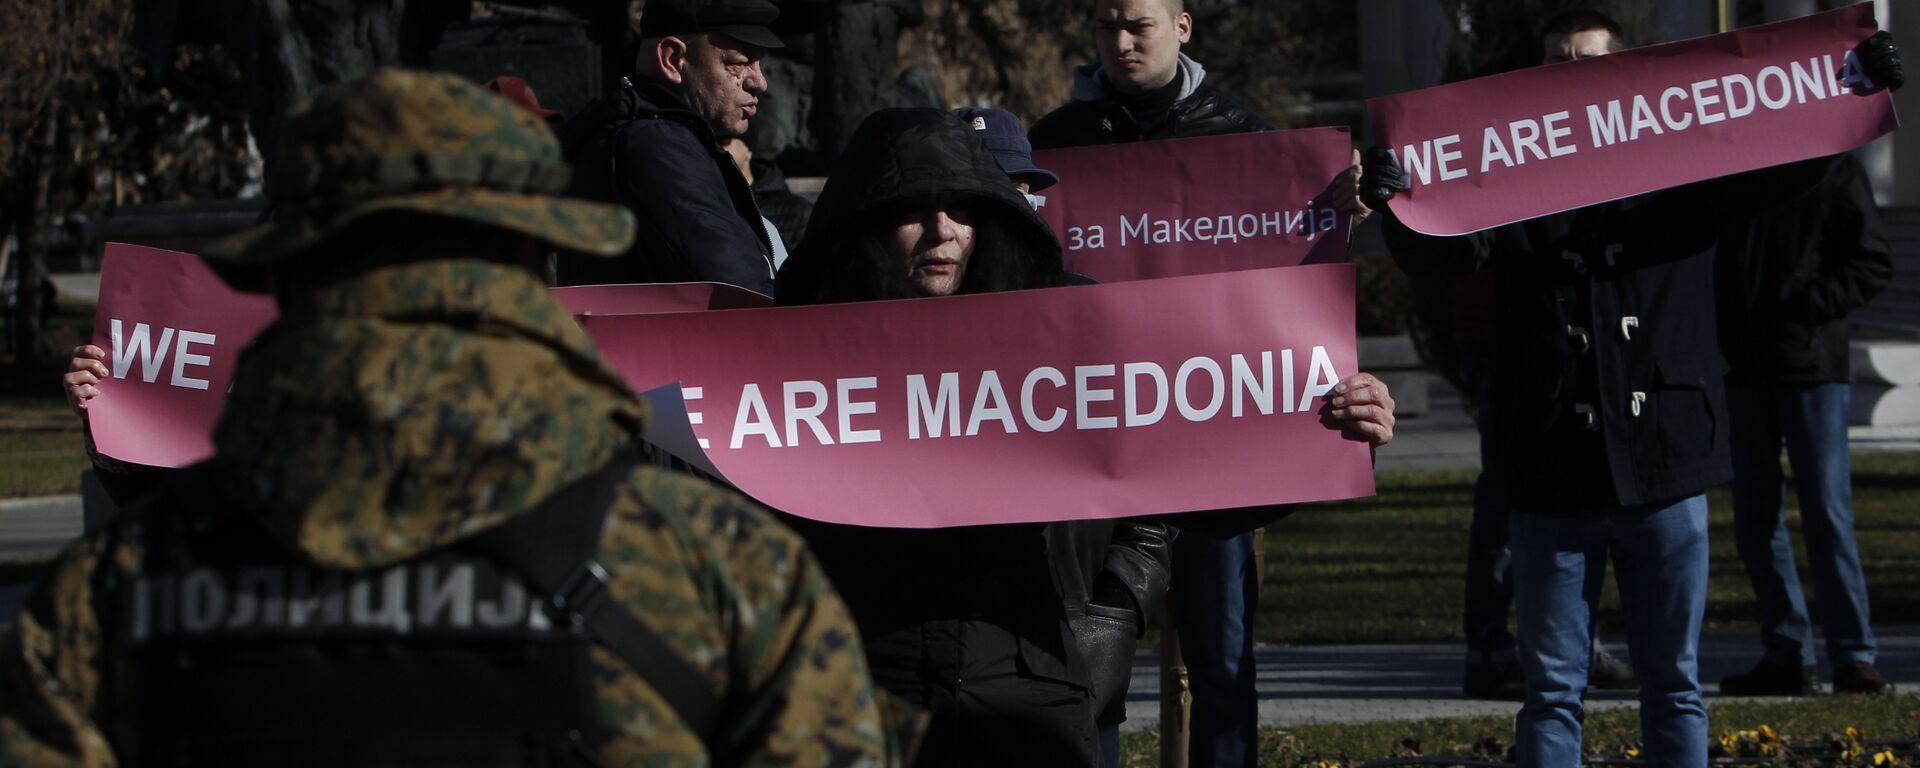 Manifestación en Macedonia - Sputnik Mundo, 1920, 19.06.2018